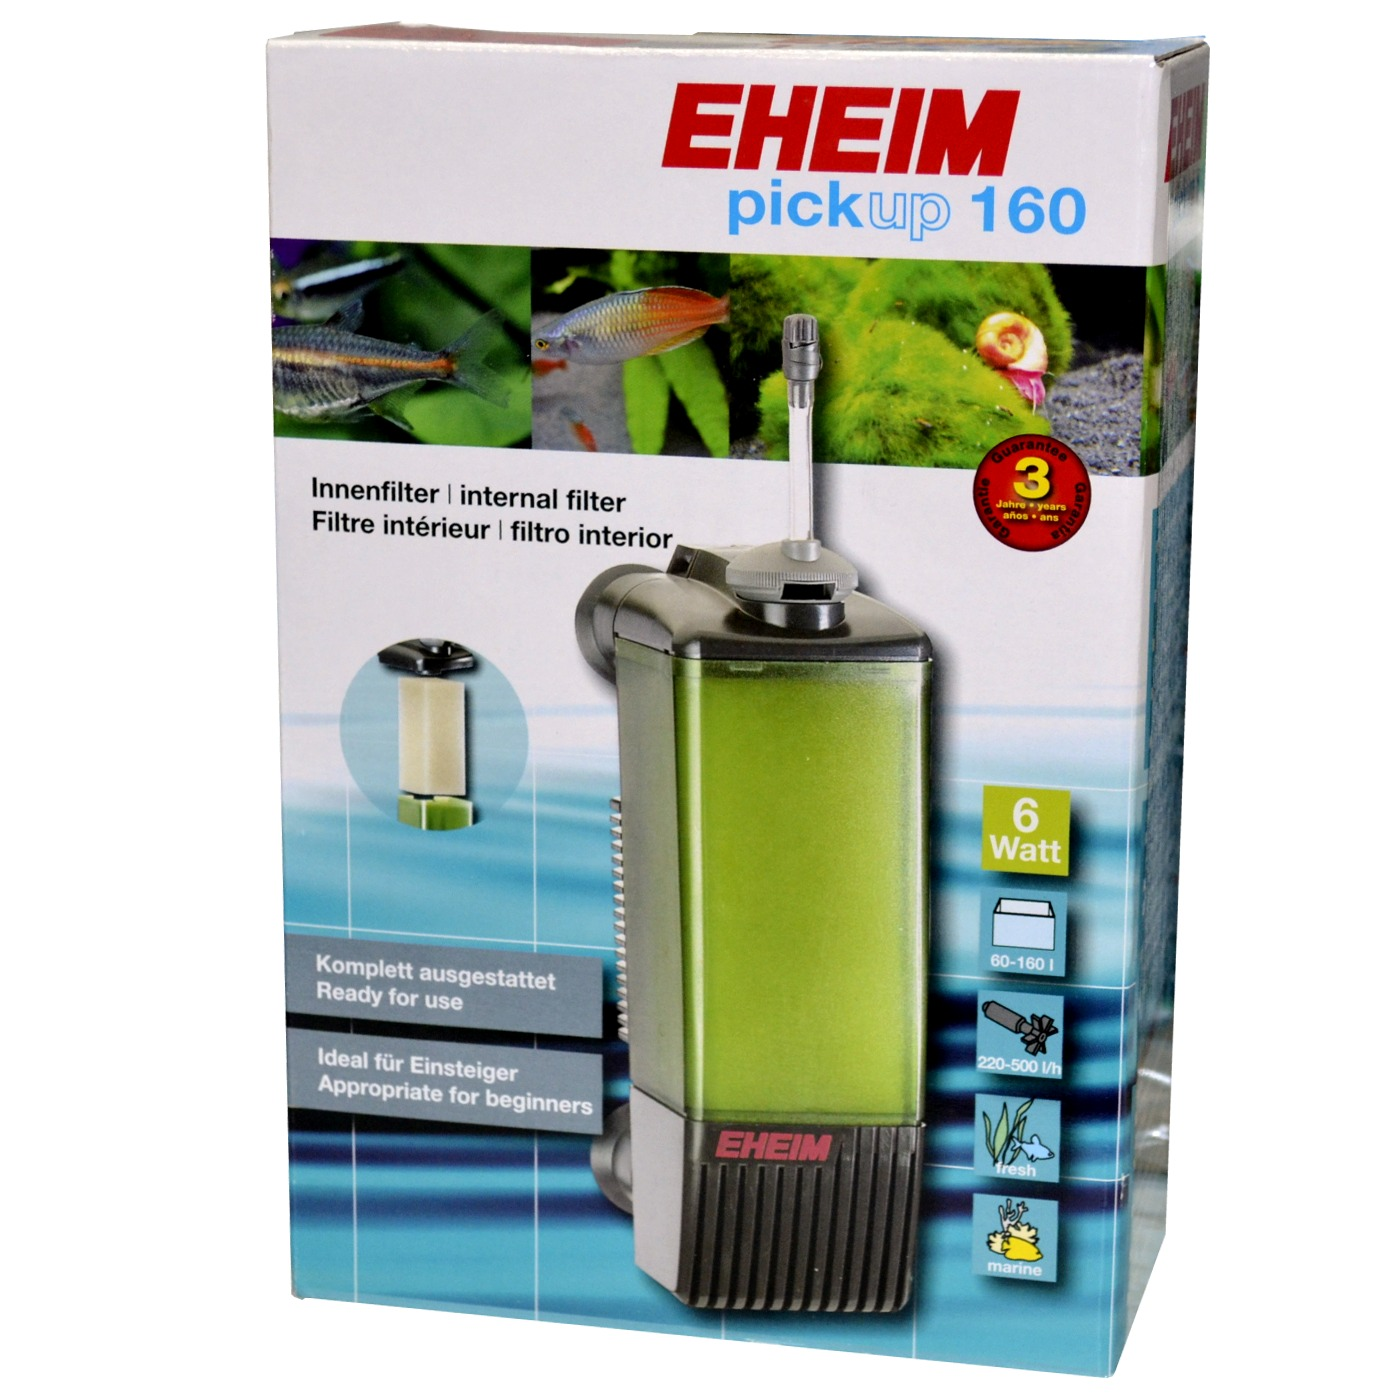 Eheim pickup 160 filtre interne pour aquarium de 60 160 for Filtre petit aquarium